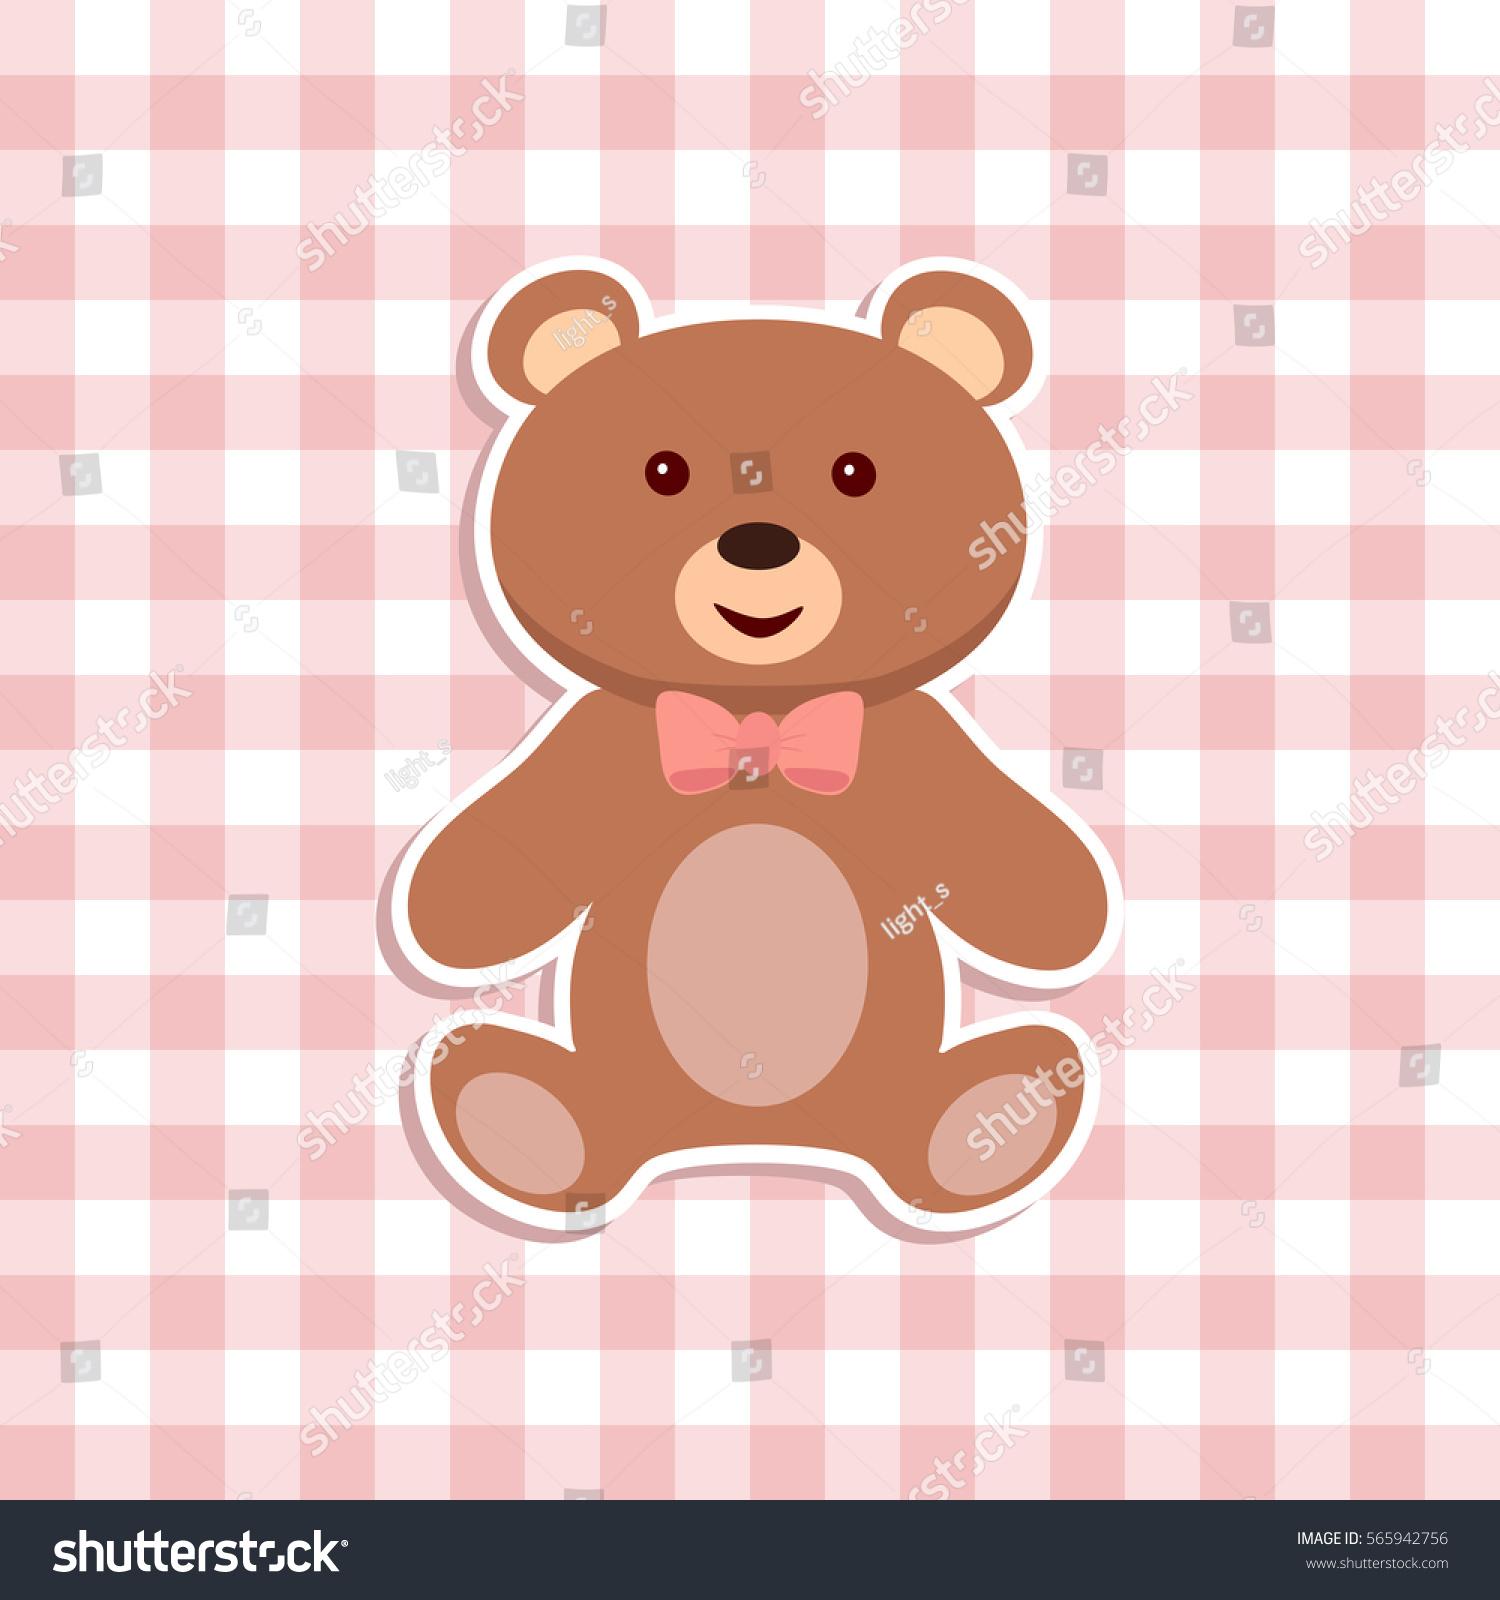 teddy bear toy sticker flat icon stock vector 565942756 shutterstock